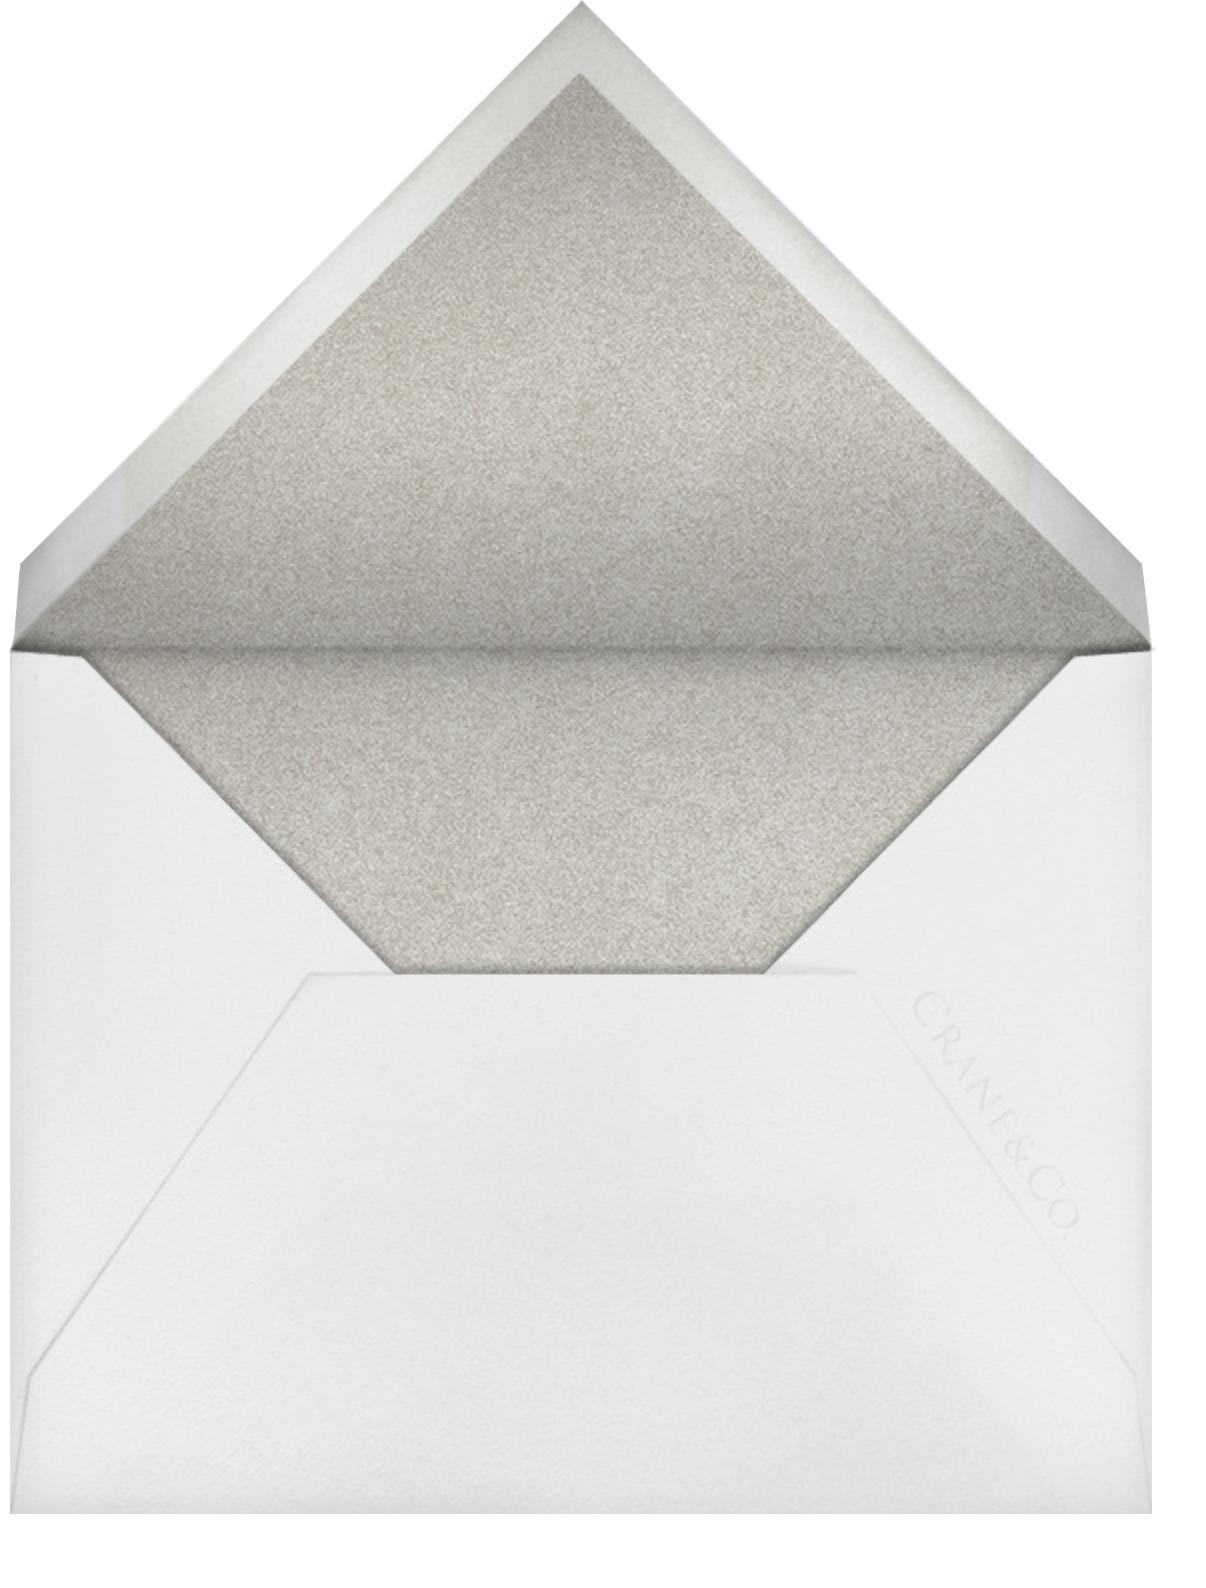 Silk Brocade I (Save the Date) - Platinum - Oscar de la Renta - Envelope